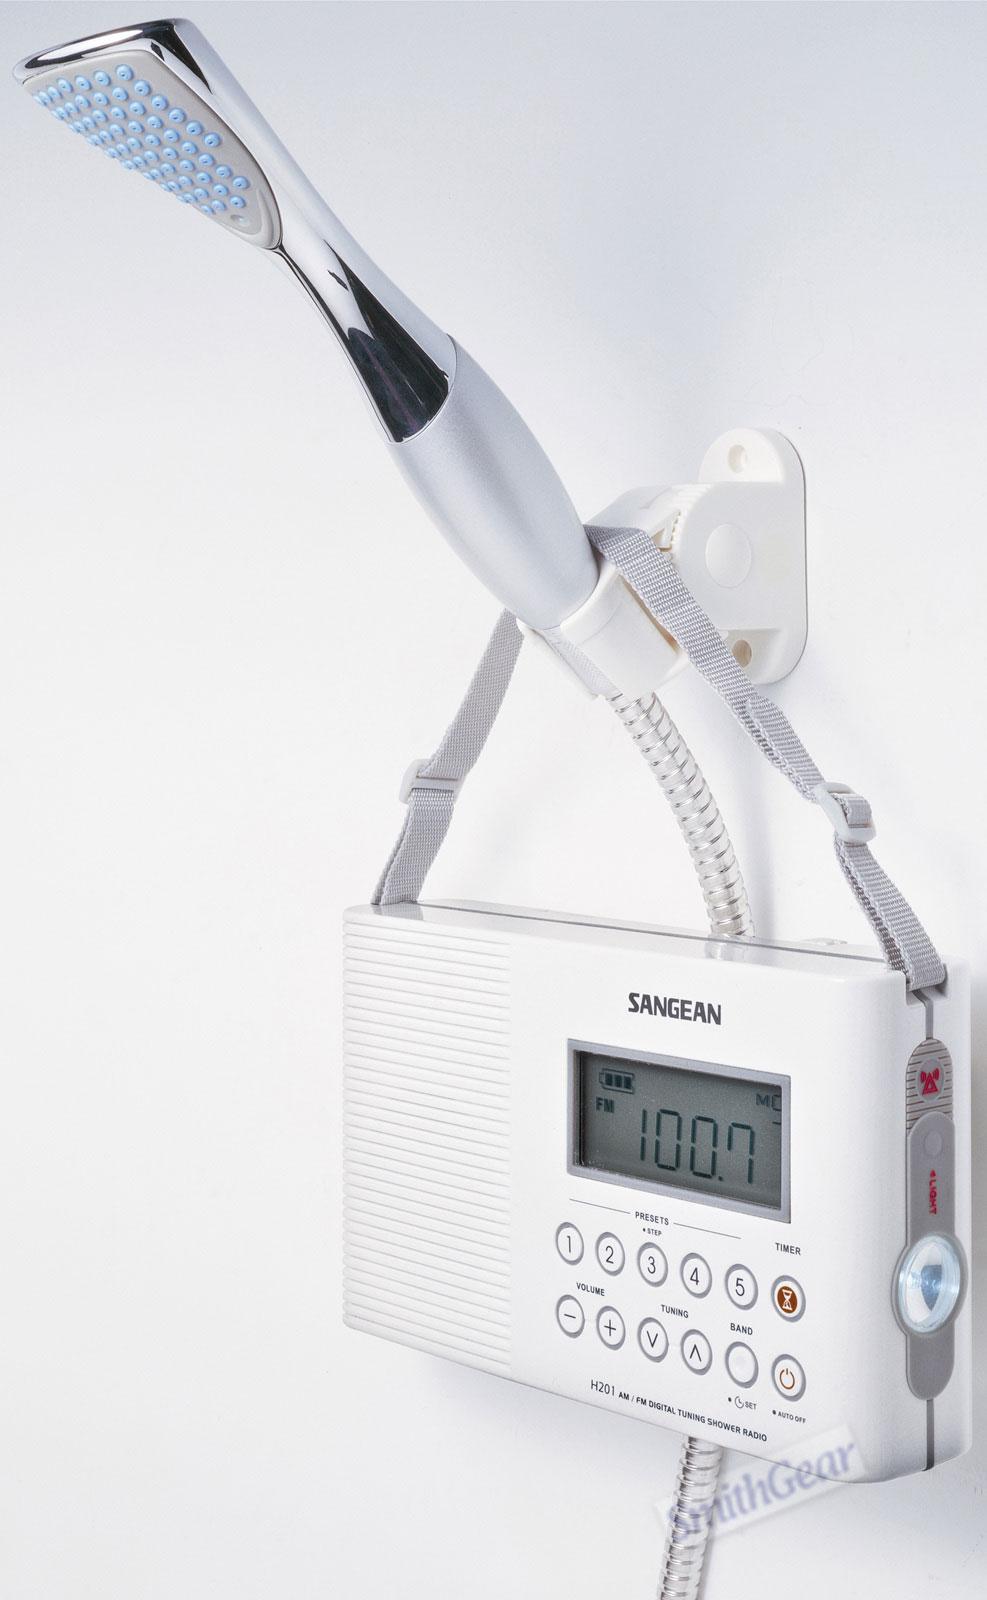 Sangean H201 Shower Radio Boating Waterproof Portable Am Fm